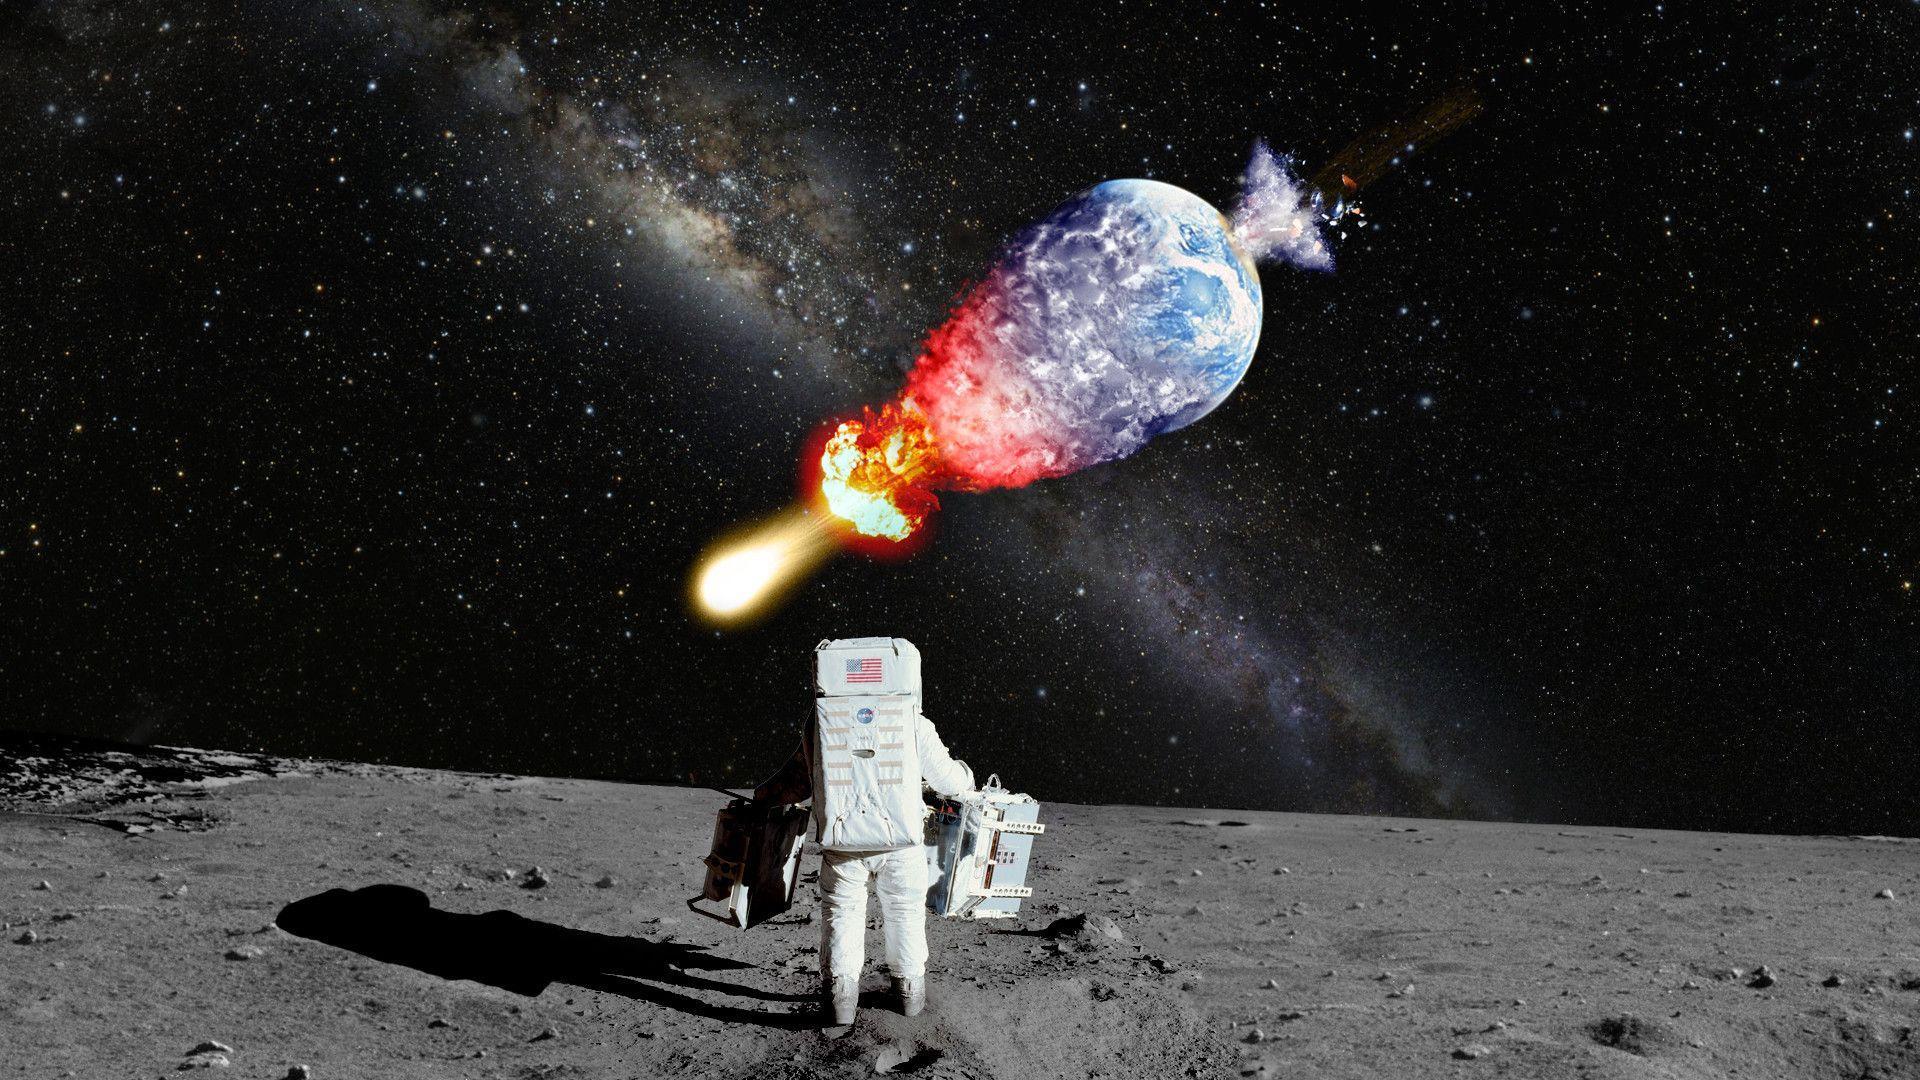 Moon Man Wallpapers Top Free Moon Man Backgrounds Wallpaperaccess